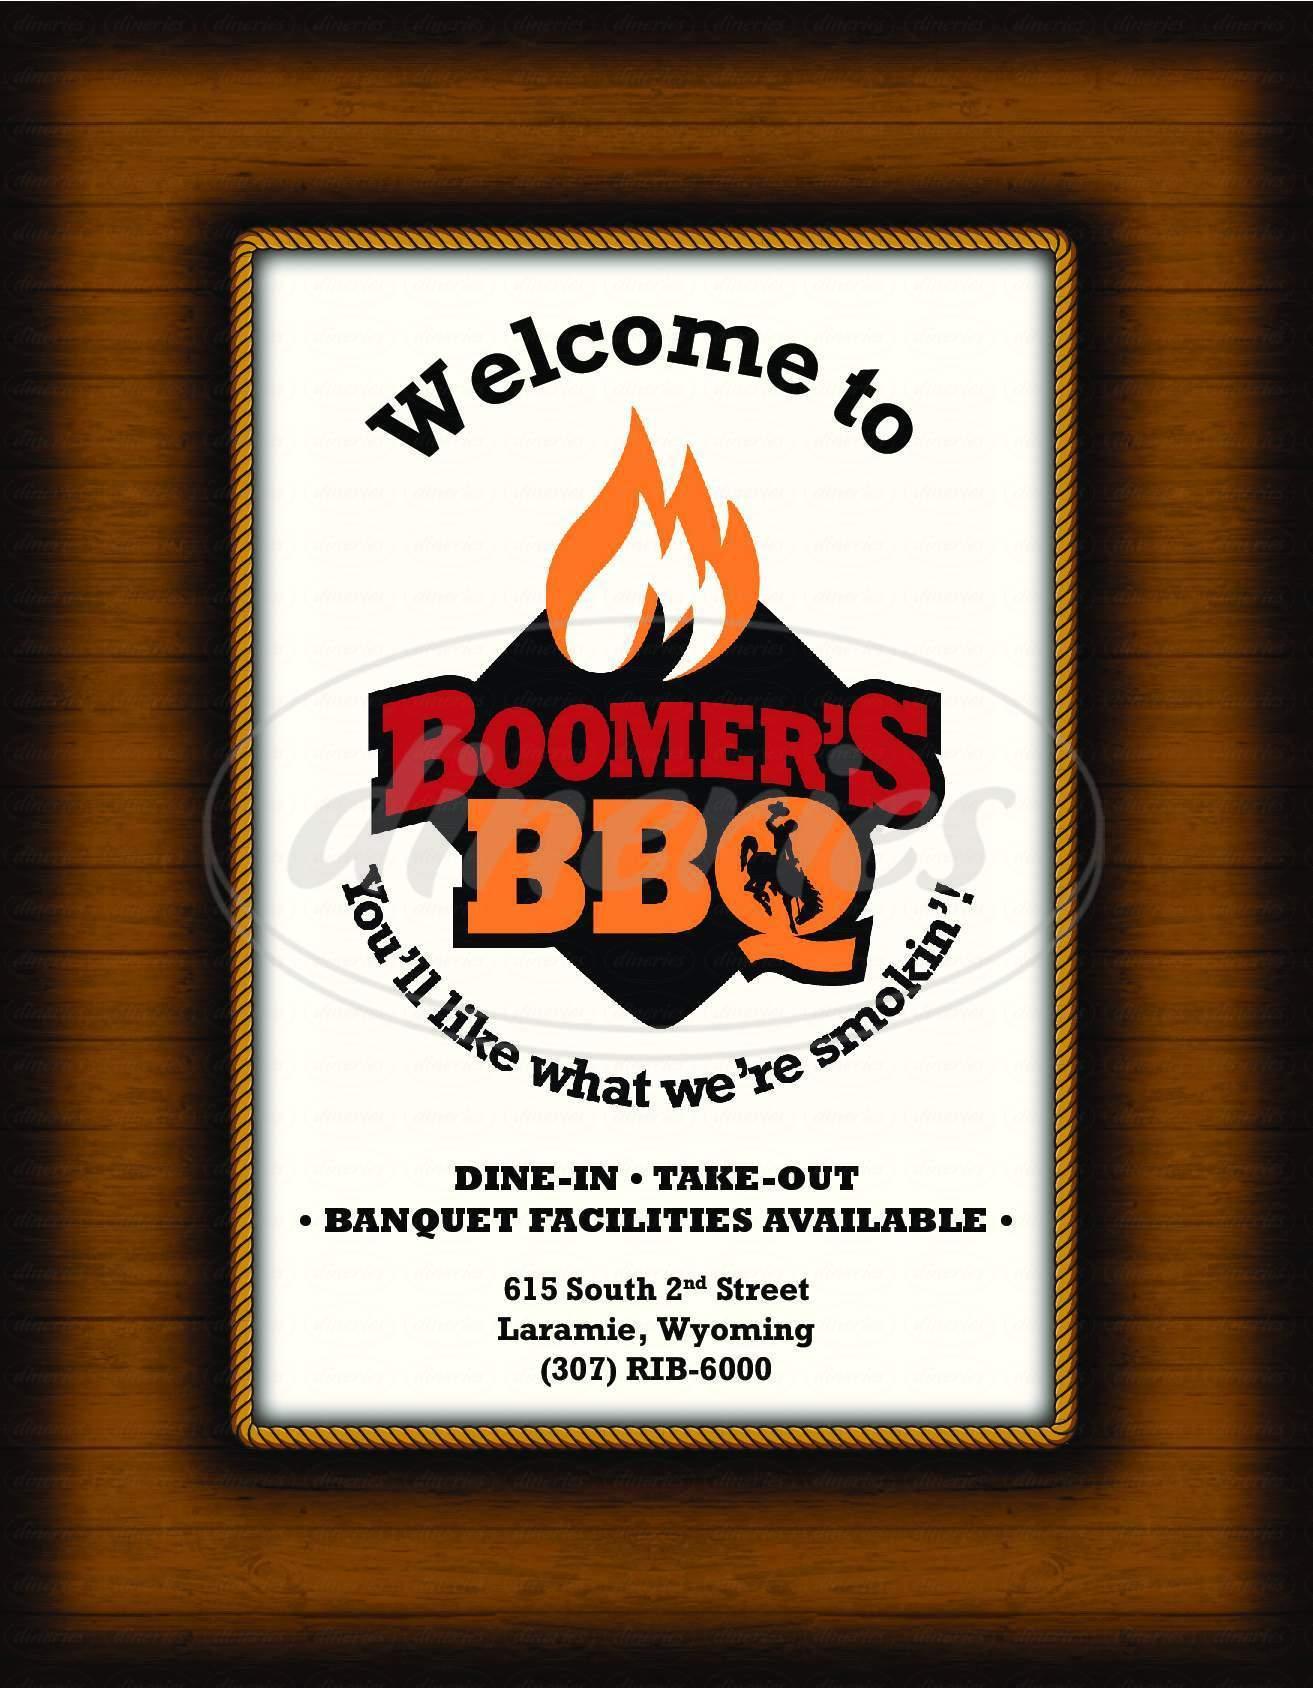 menu for Boomer's BBQ